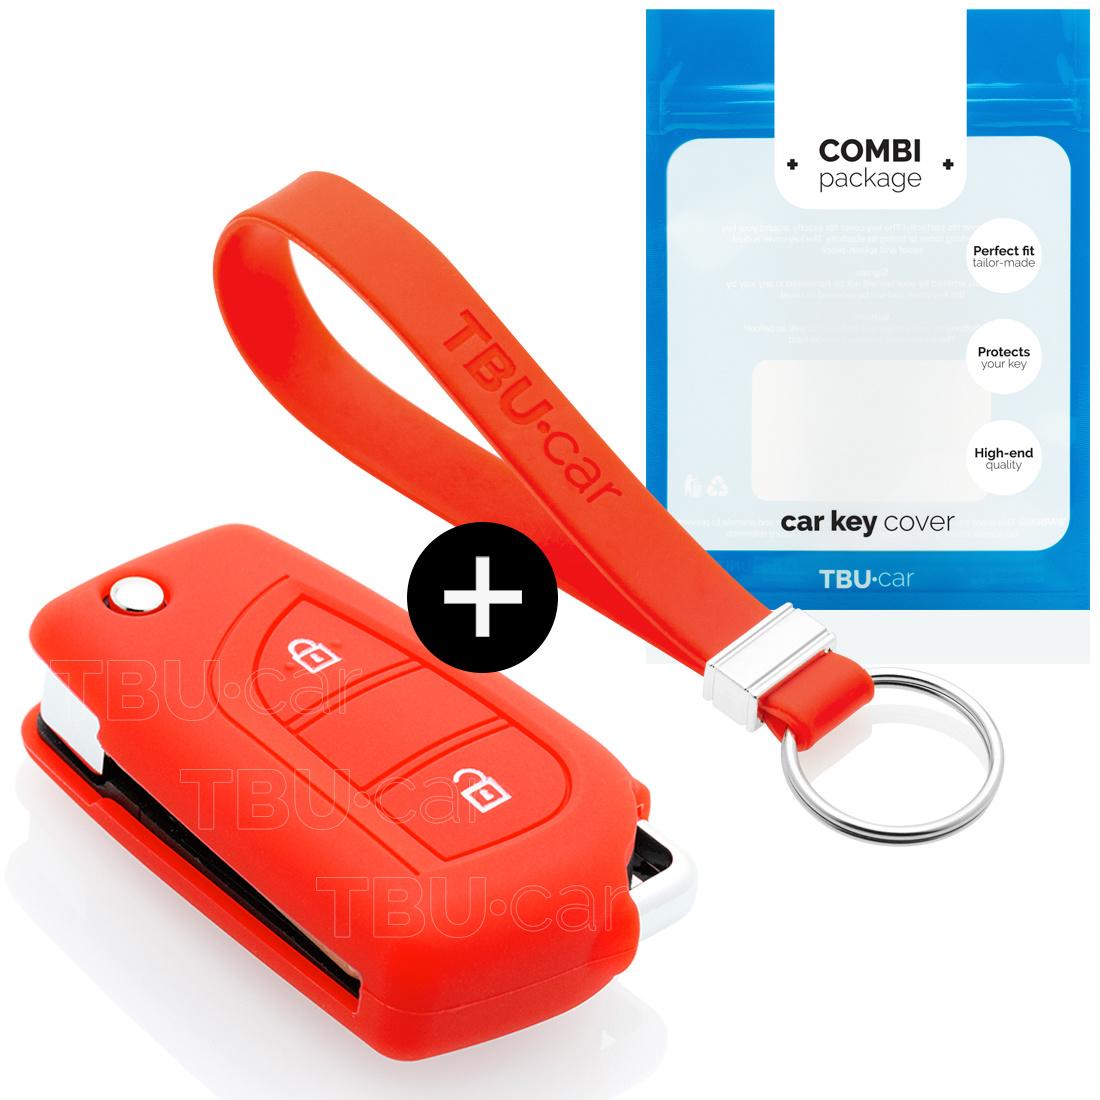 TBU car TBU car Autoschlüssel Hülle kompatibel mit Toyota 2 Tasten - Schutzhülle aus Silikon - Auto Schlüsselhülle Cover in Rot